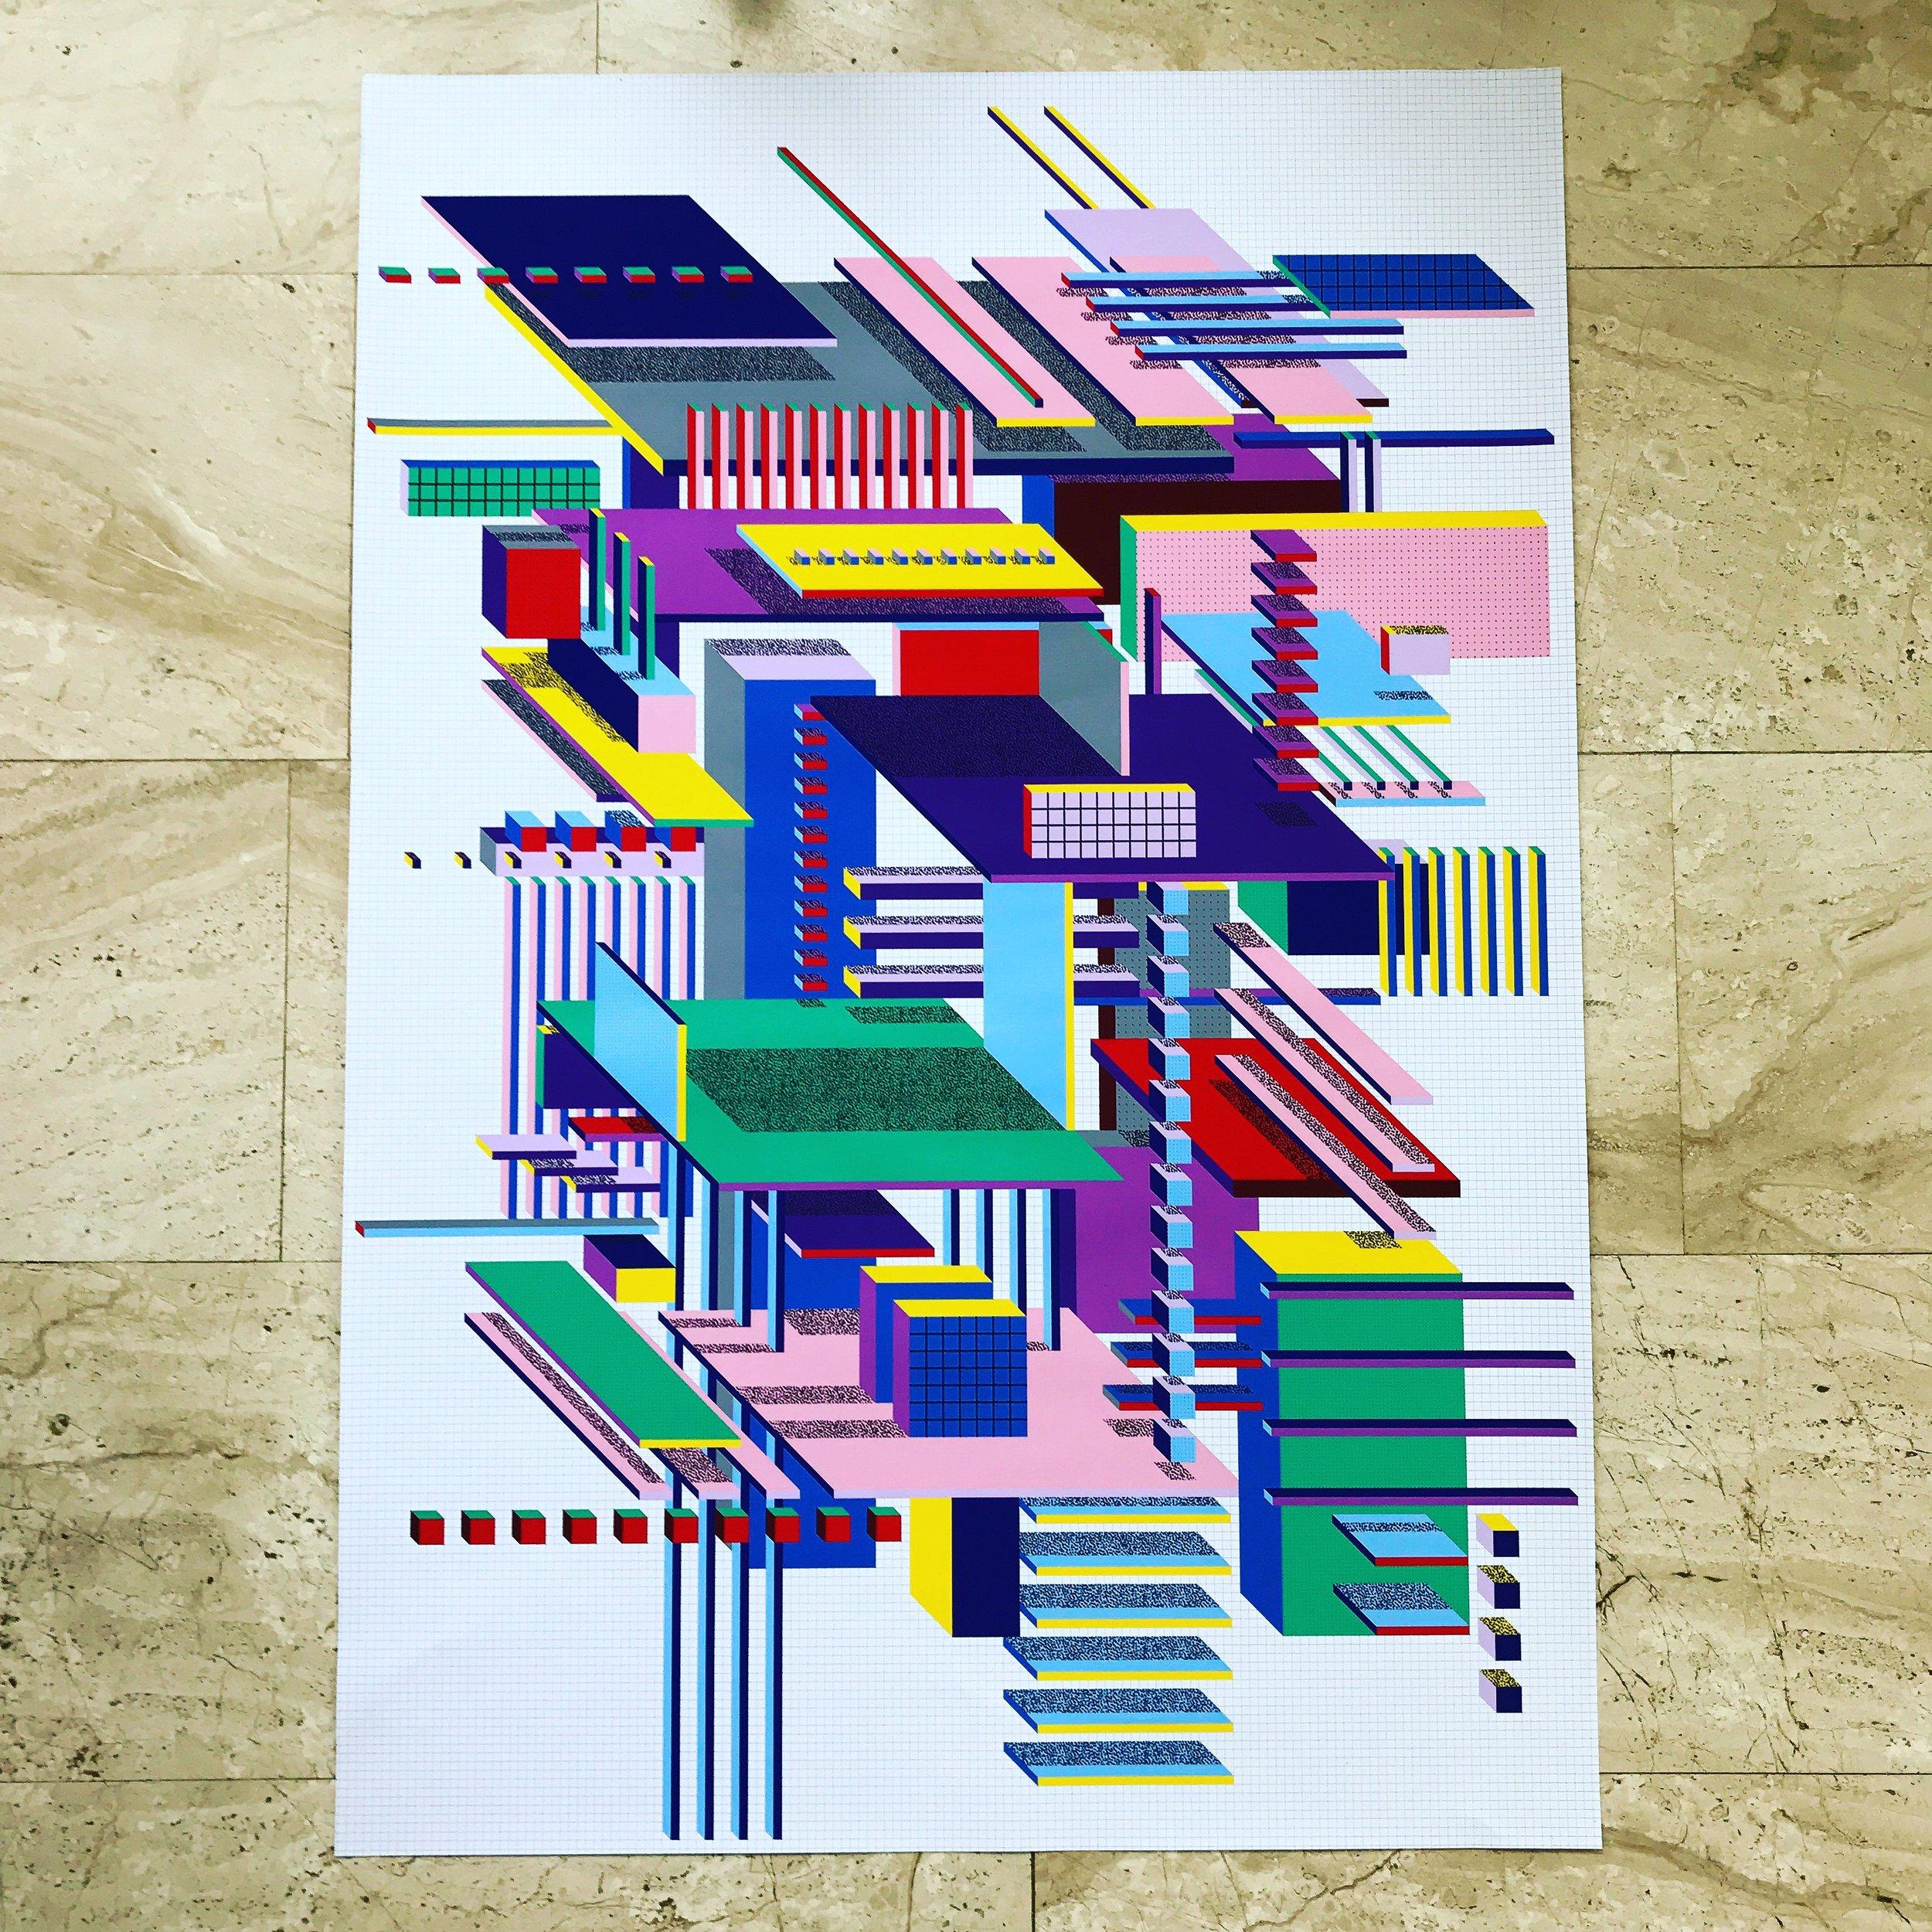 A1 size poster print